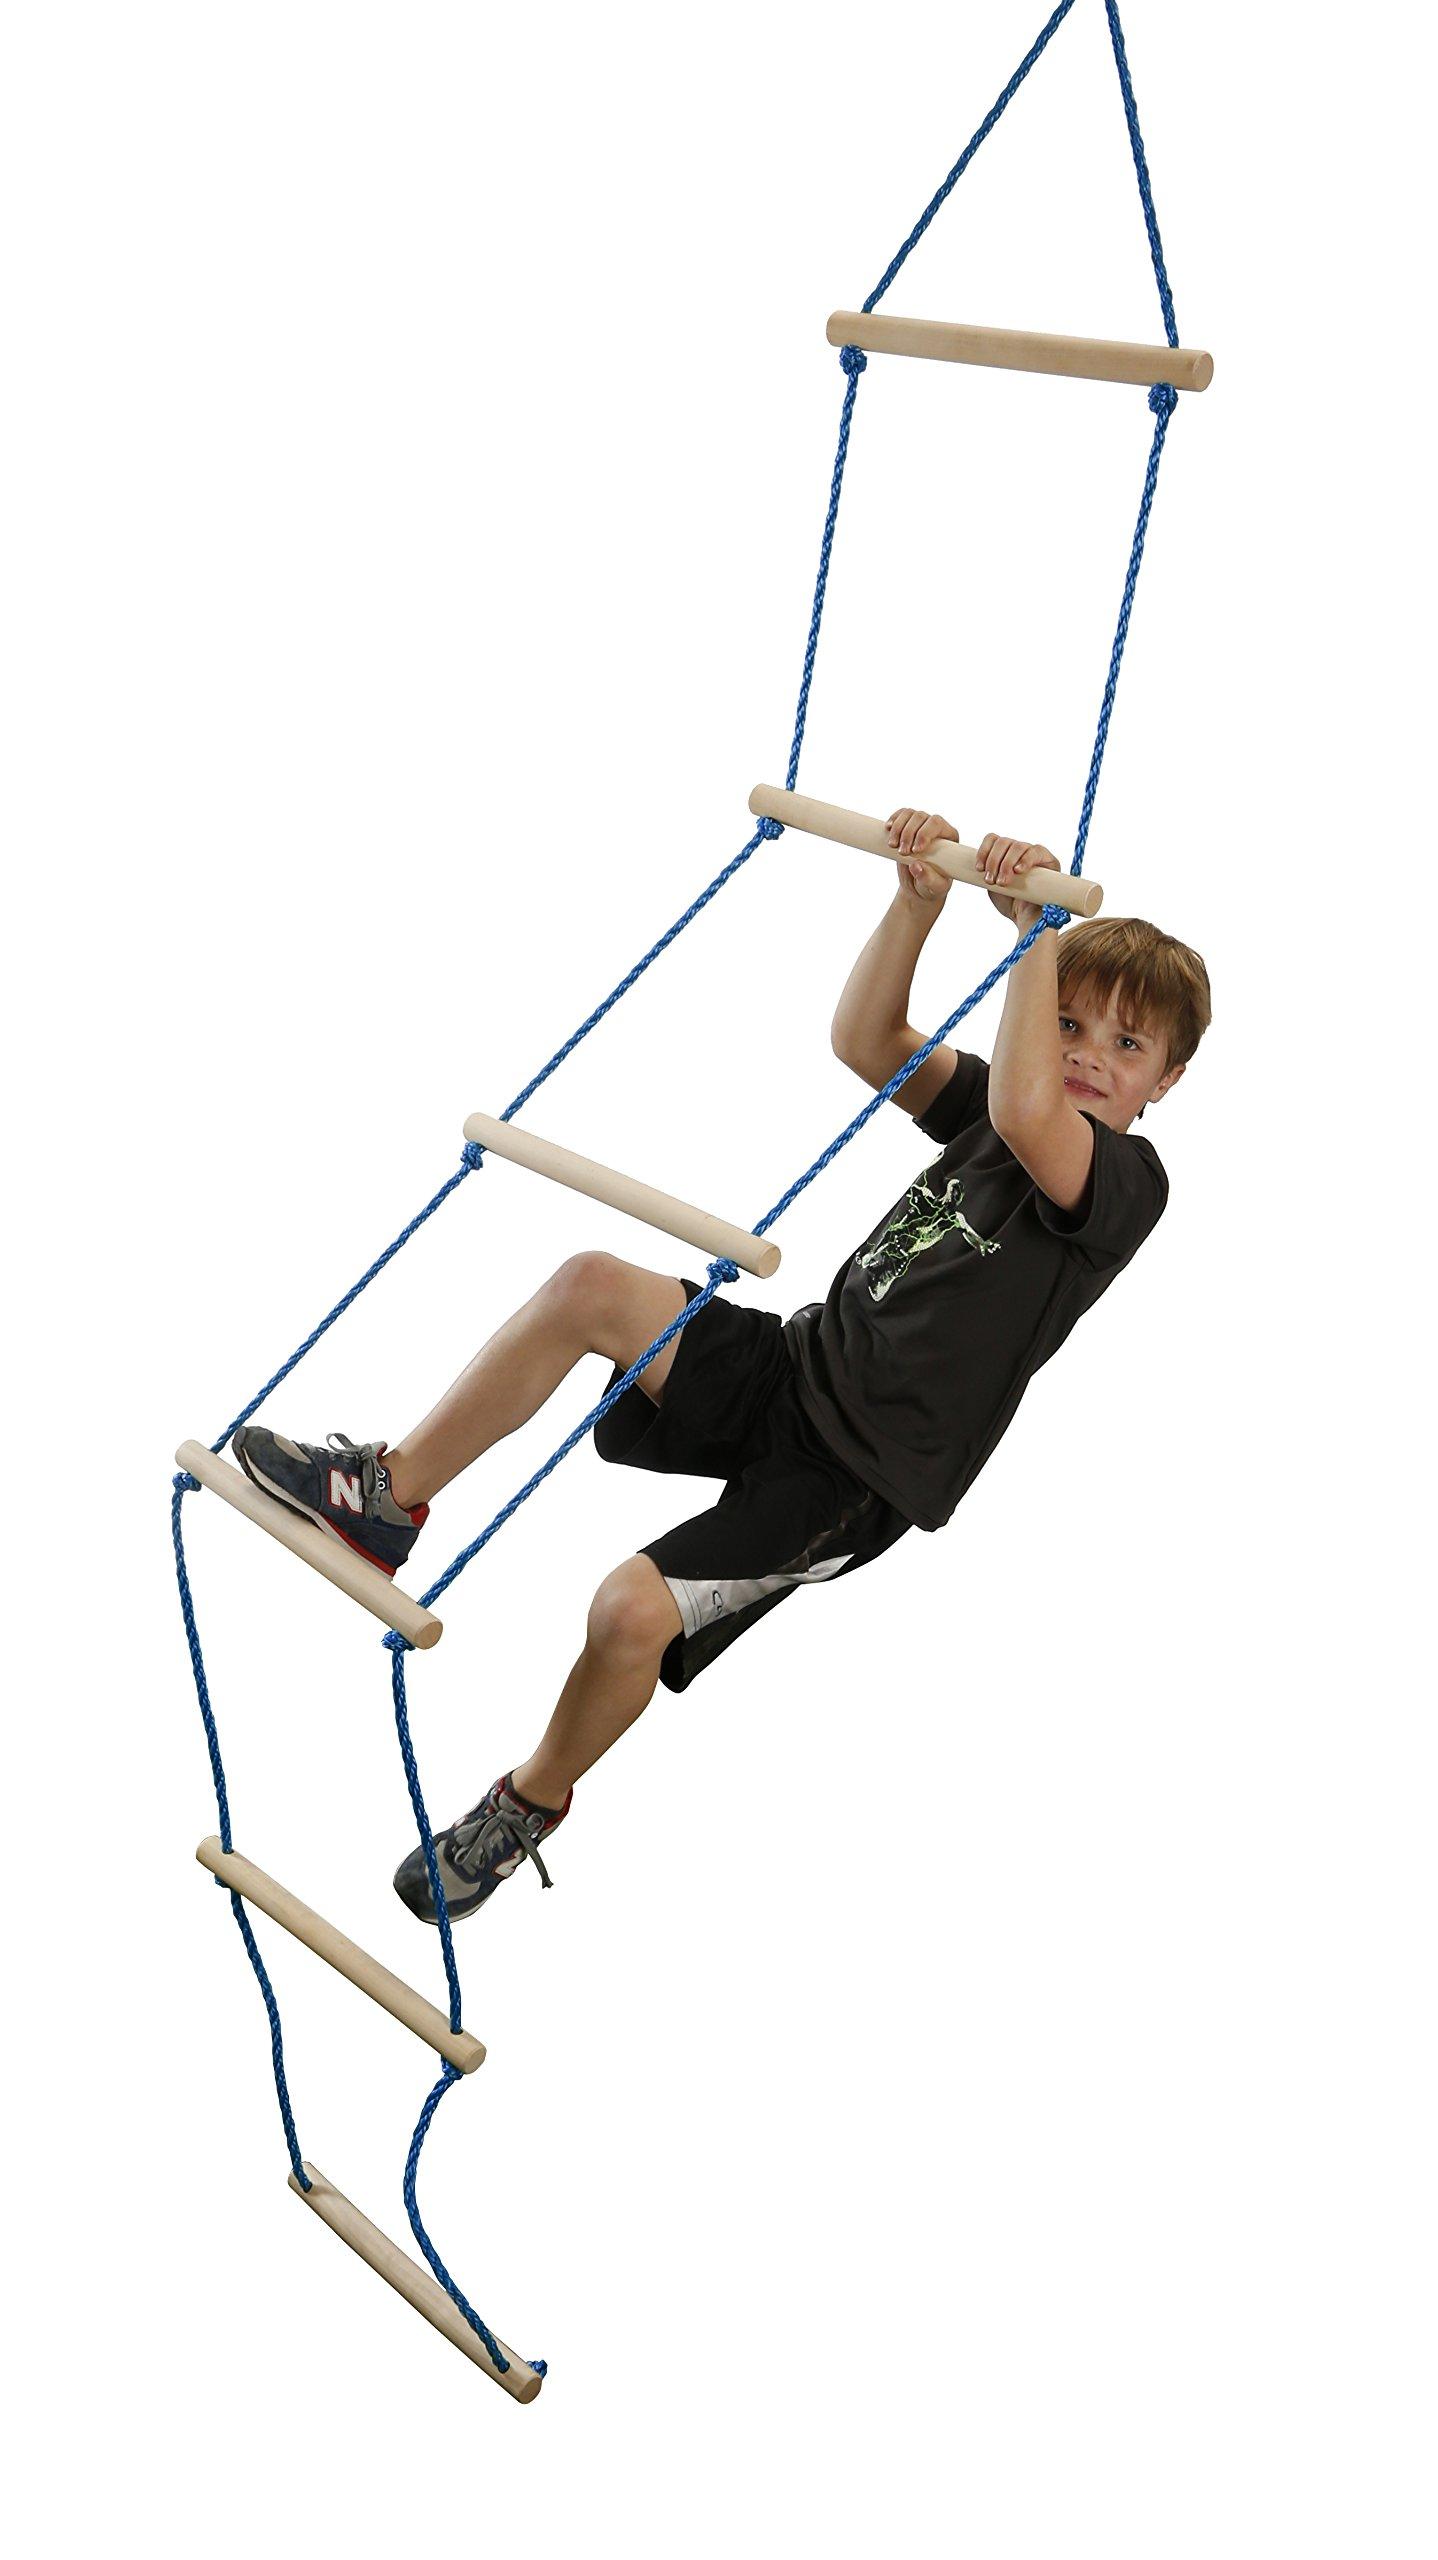 Slackers NinjaLine Rope Ladder, Blue, 8' by Slackers (Image #3)